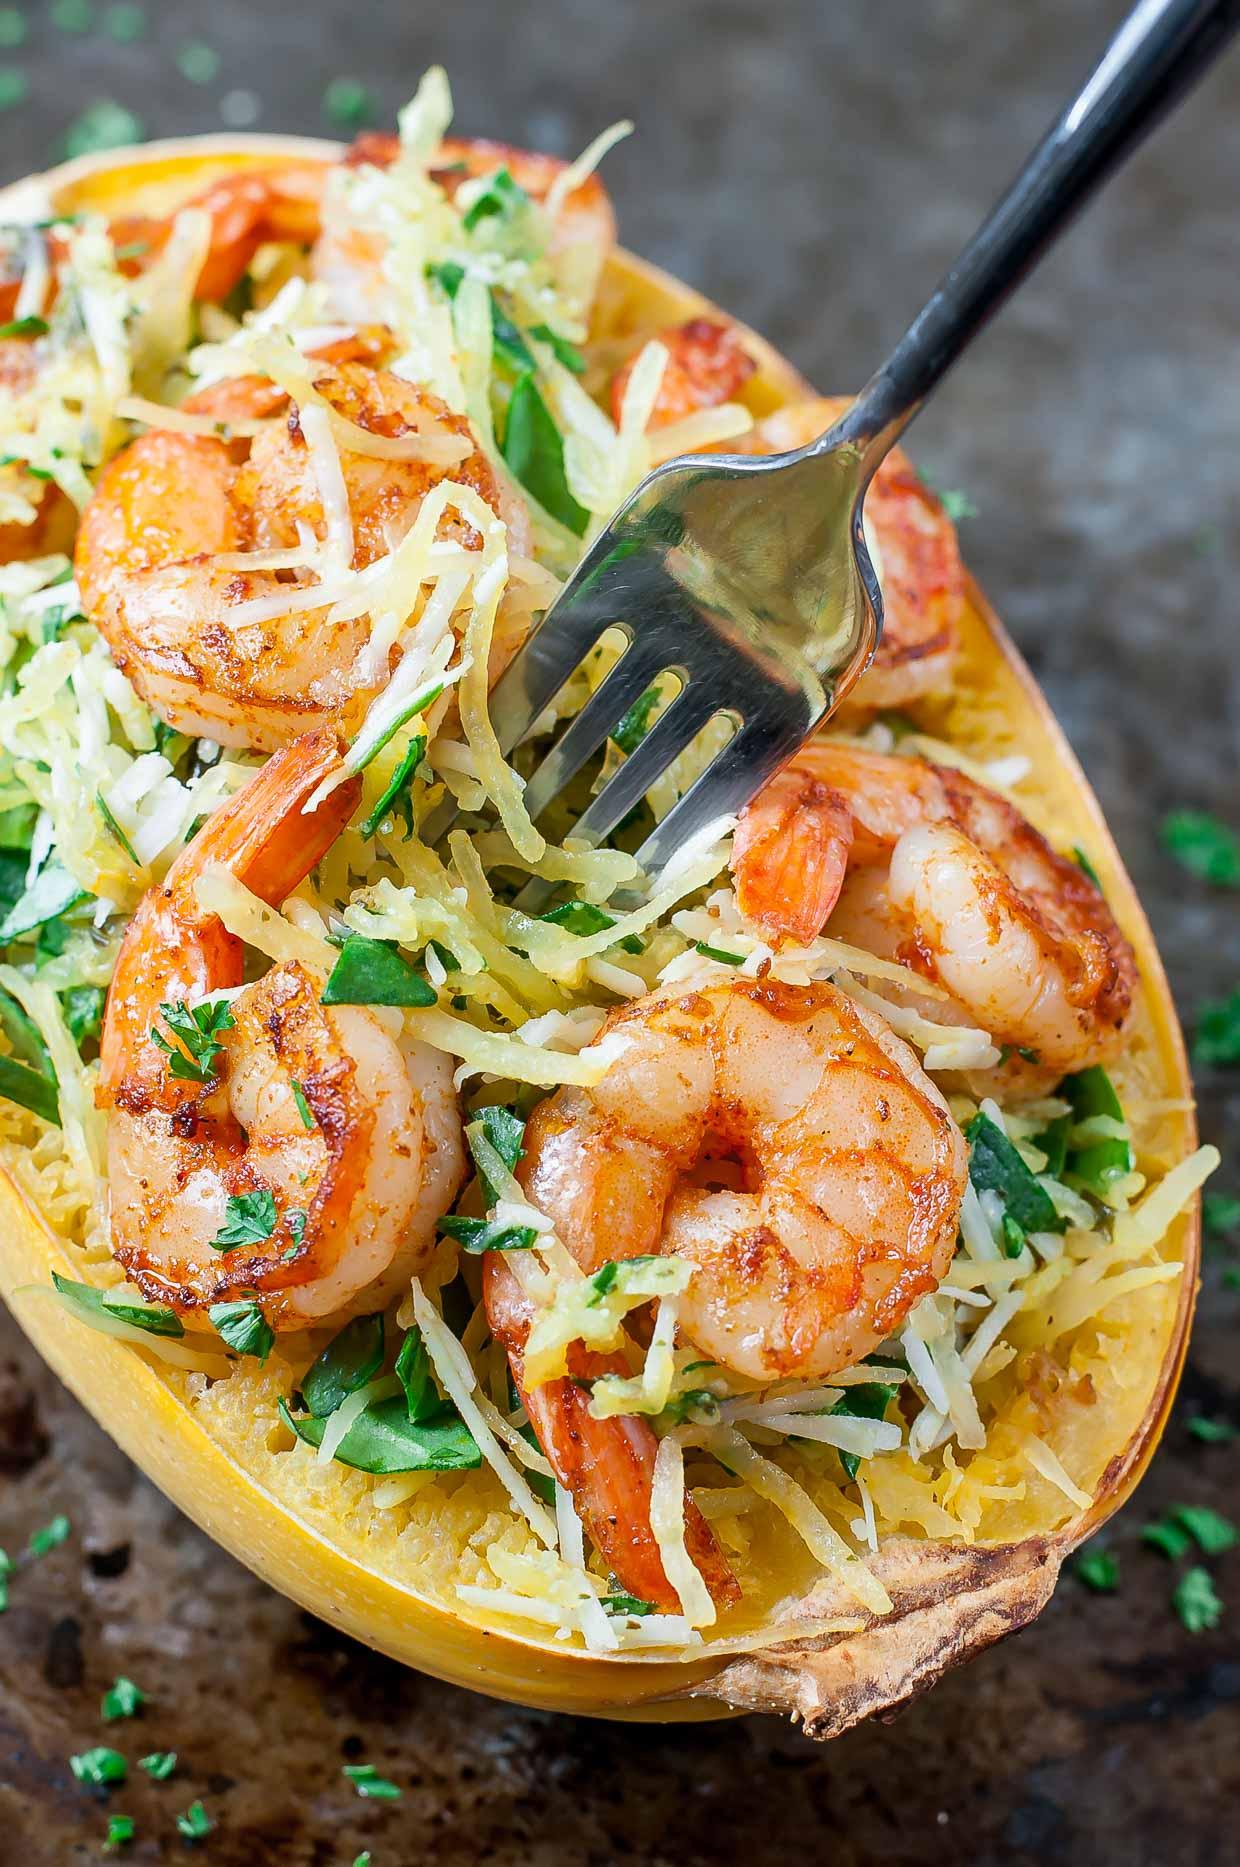 Pesto parmesan spaghetti squash shrimp recipe peasandcrayons 0144